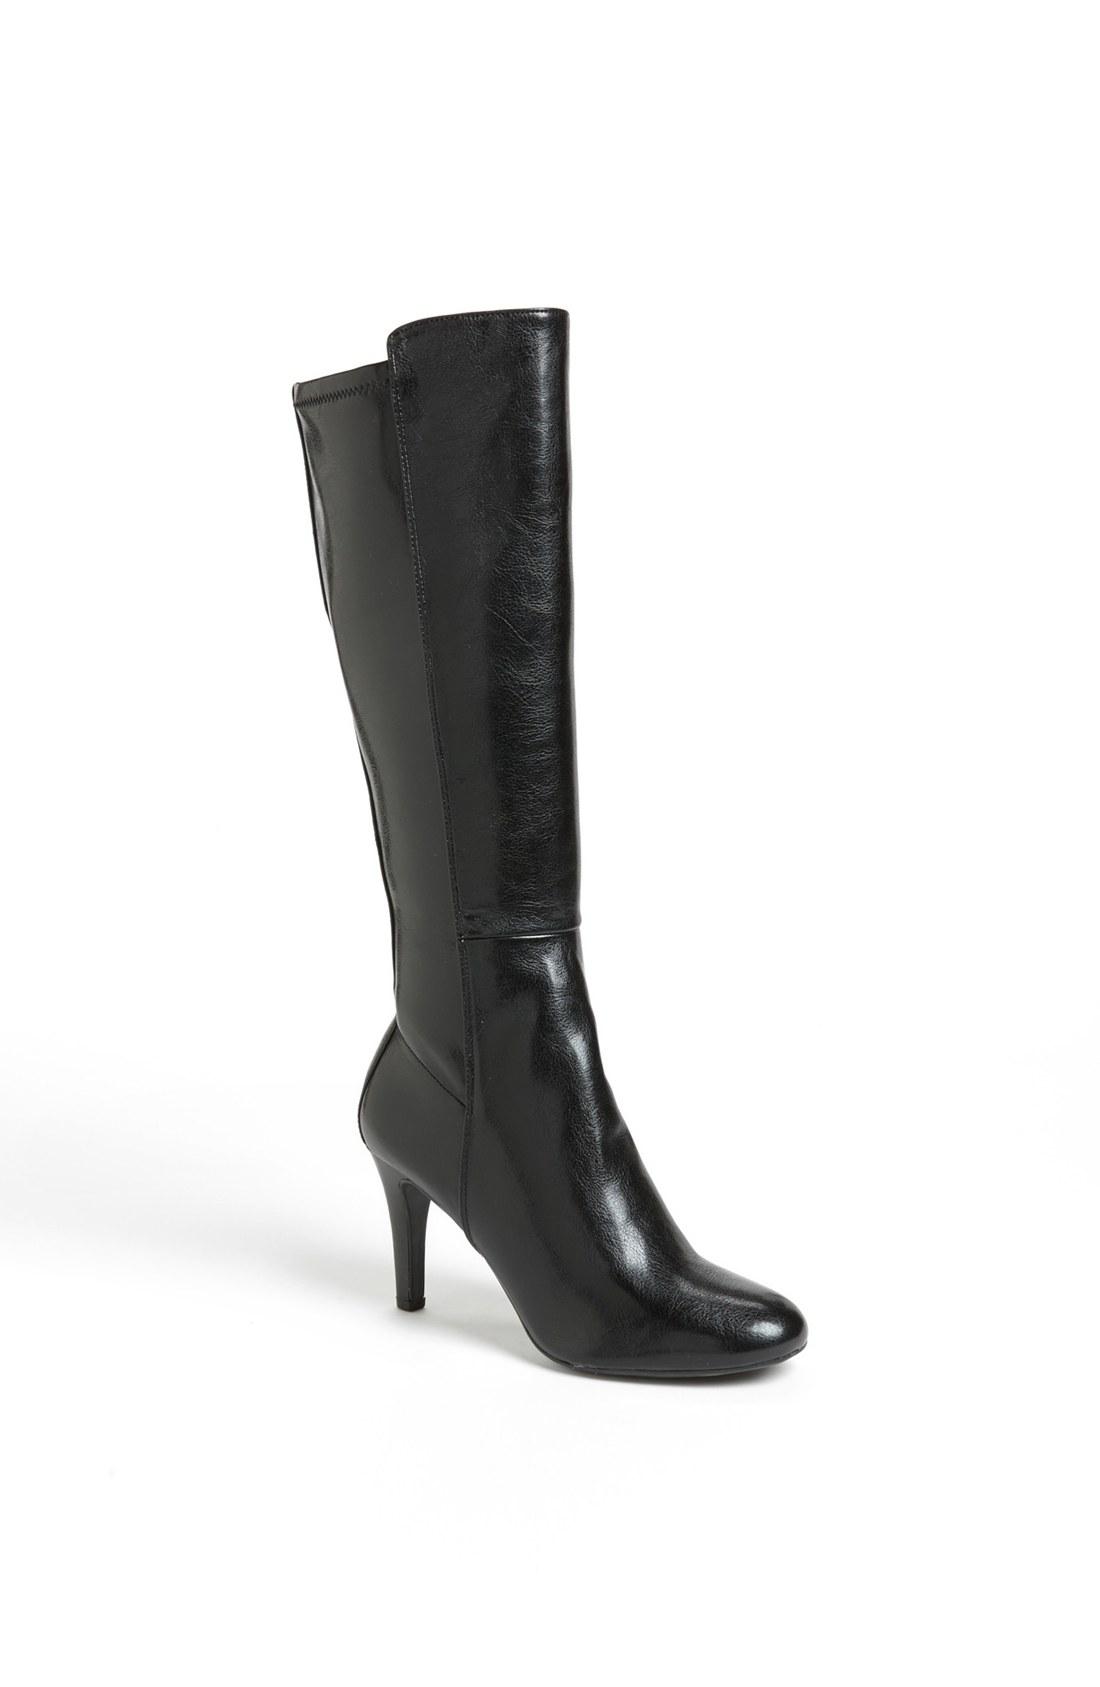 Franco sarto black boots 28 images franco sarto clint for Franco sarto motor over the knee boots